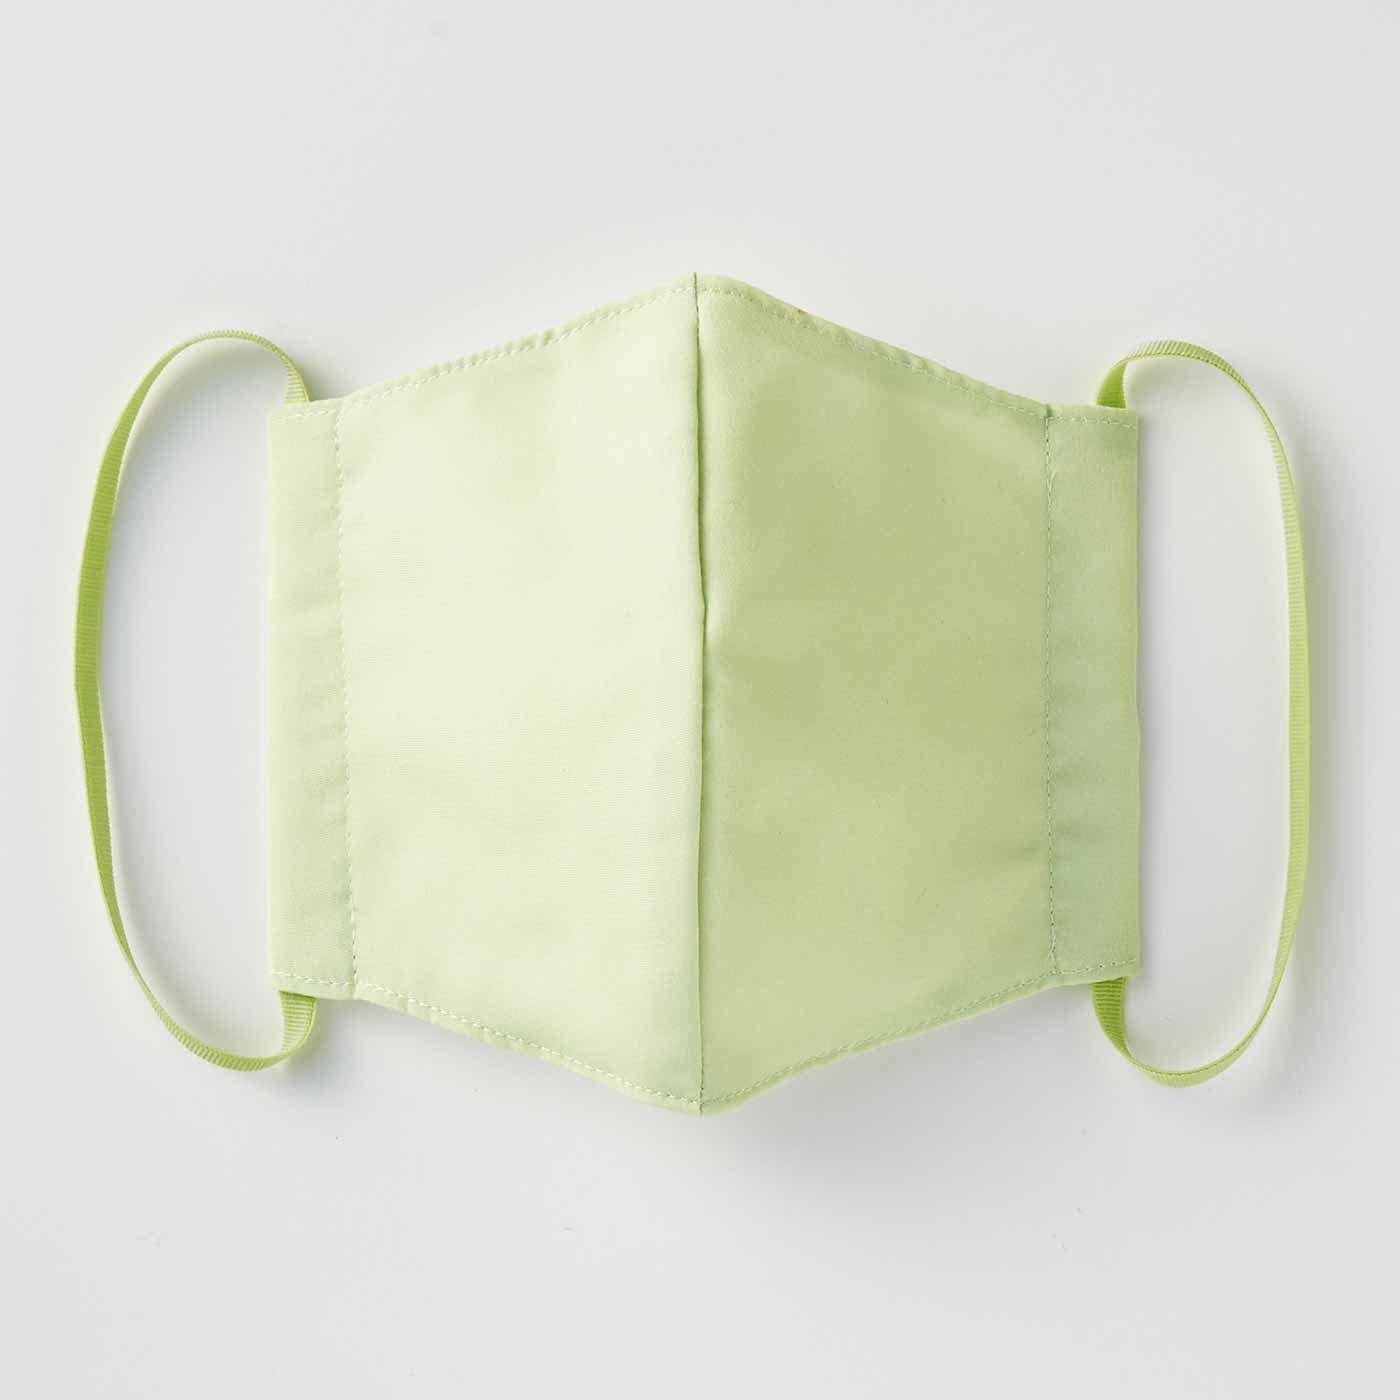 OSYAIRO UVカットのキレイカラーマスク〈グリーン〉